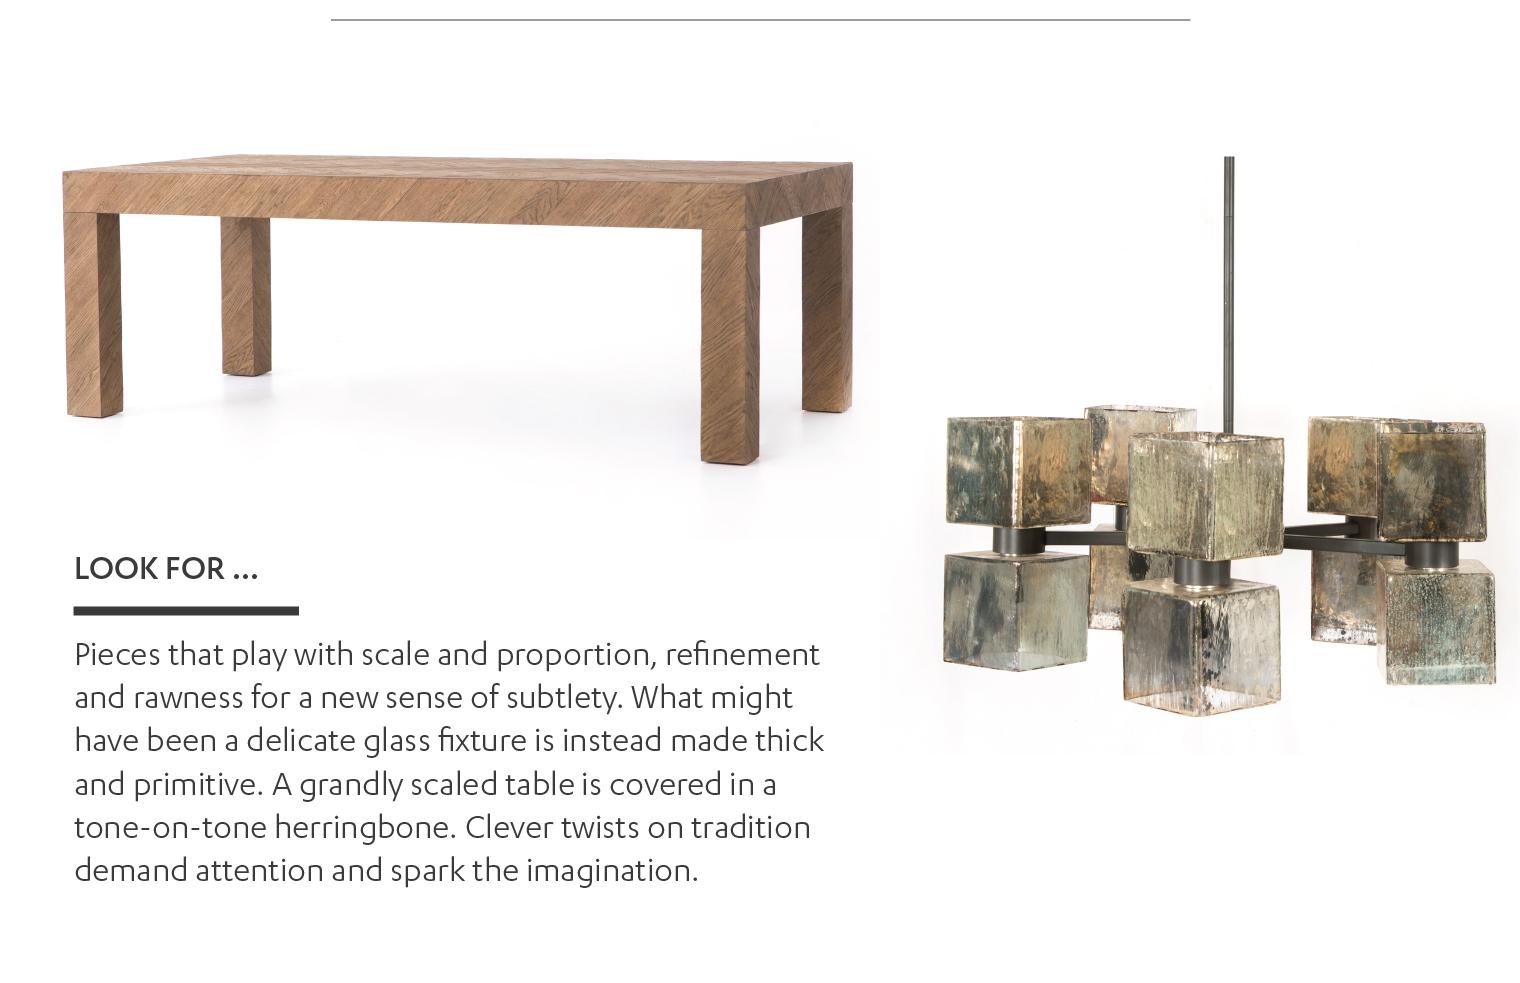 Fixtures Furniture Picture More Detailed Ashley Furniture Signature Design Derek Antler Table